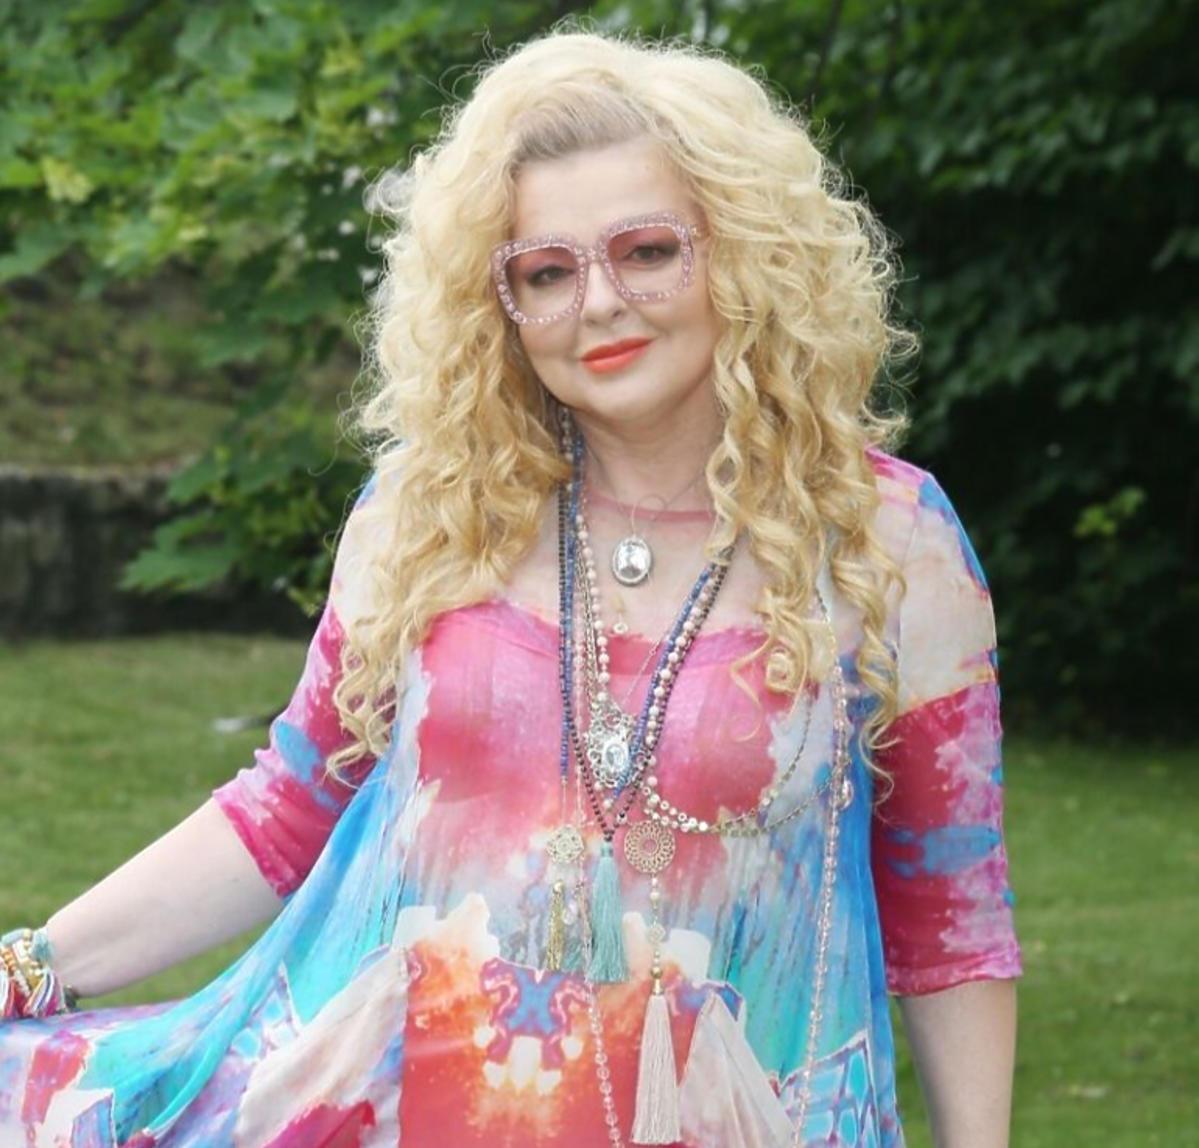 Magda Gessler w kolorowej sukience